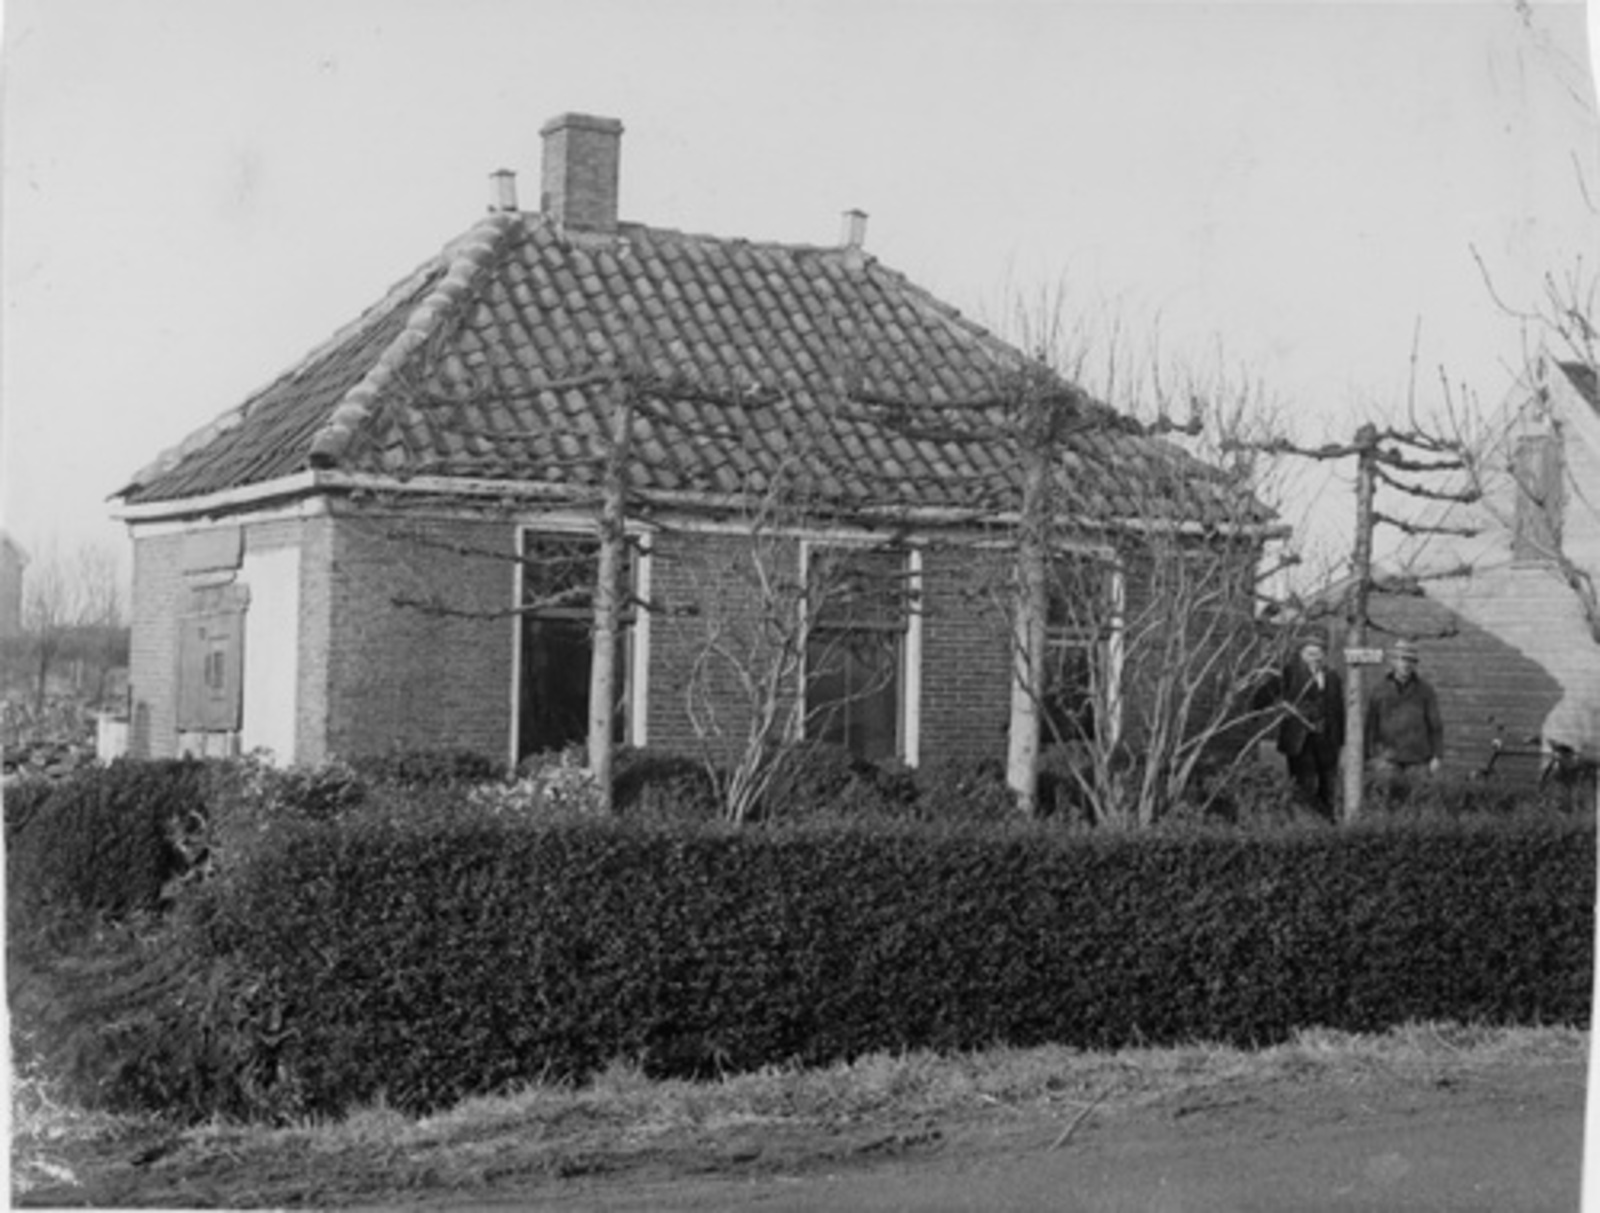 Rijnlanderweg W 0861 1953 Oud en Nieuwbouw Kaslander 01_2